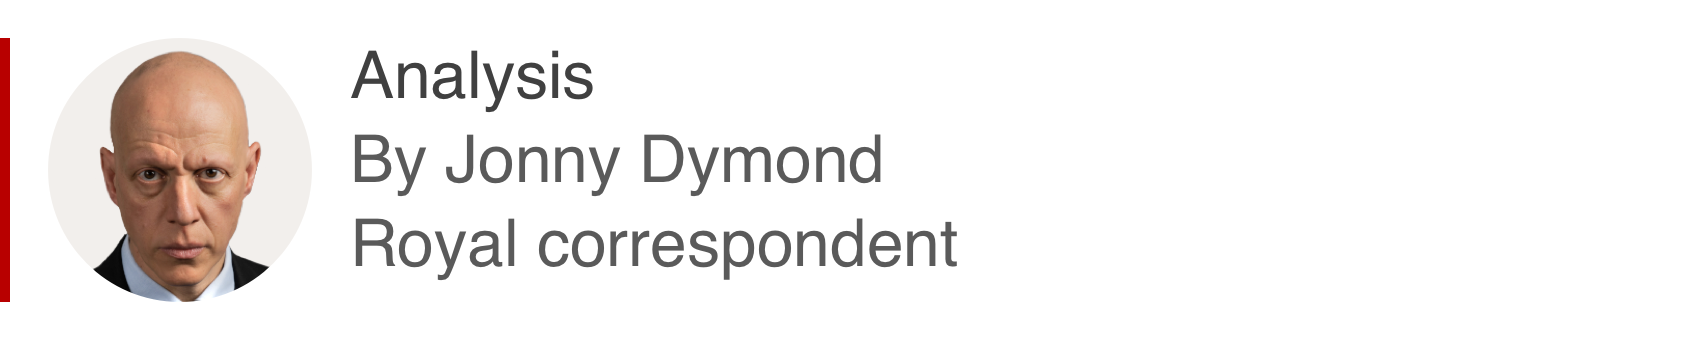 Analysis box by Jonny Dymond, royal correspondent